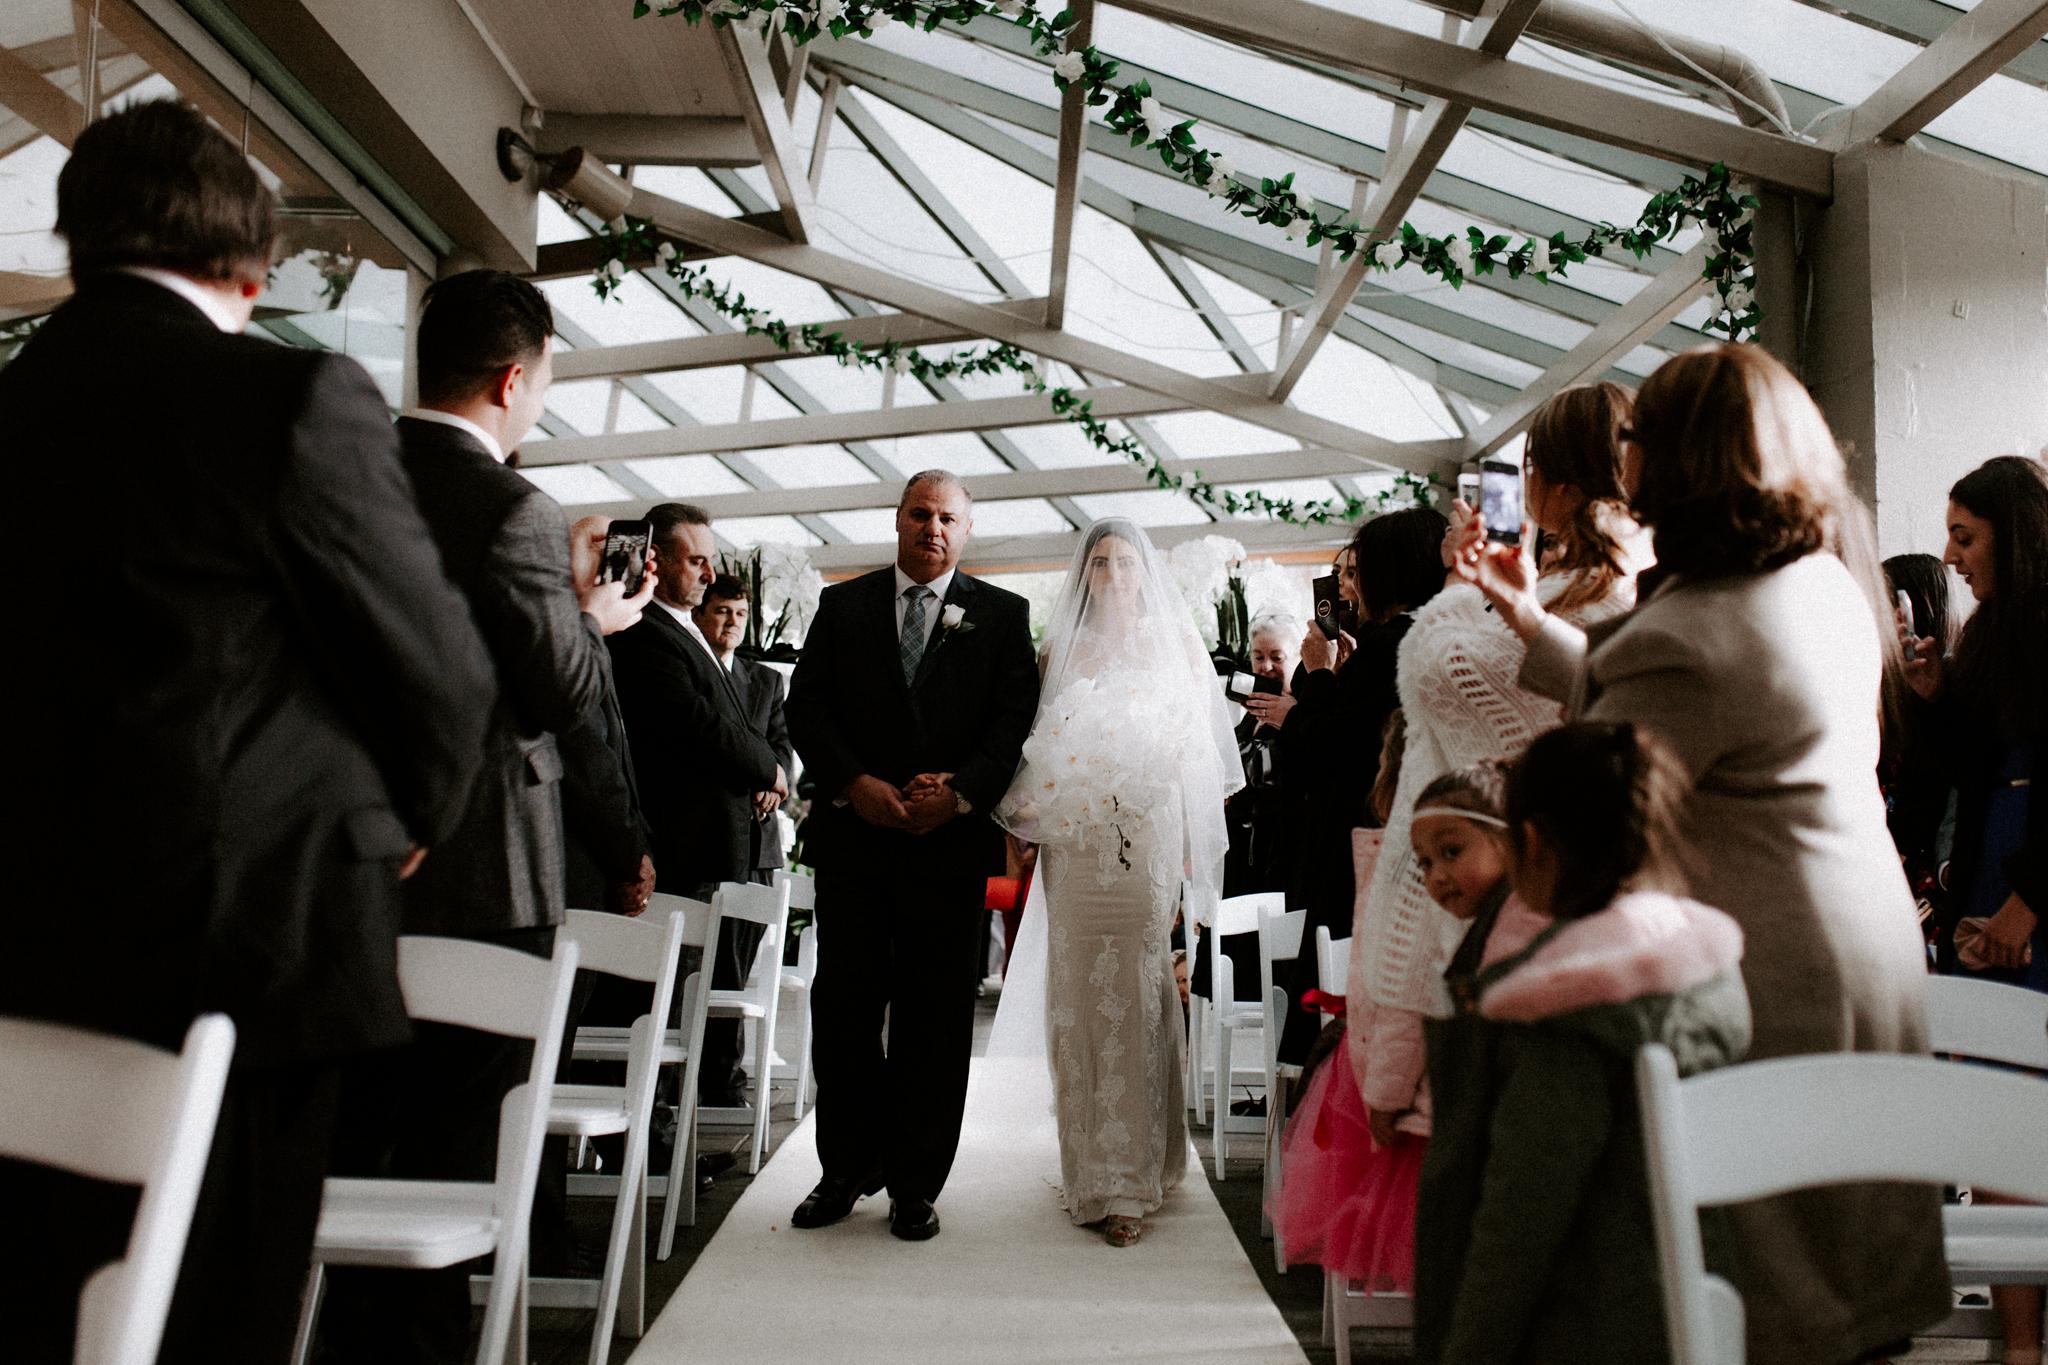 The-Terrace-Royal-Botanic-Gardens-Wedding-Emotions-and-Math-Photography-056.jpg